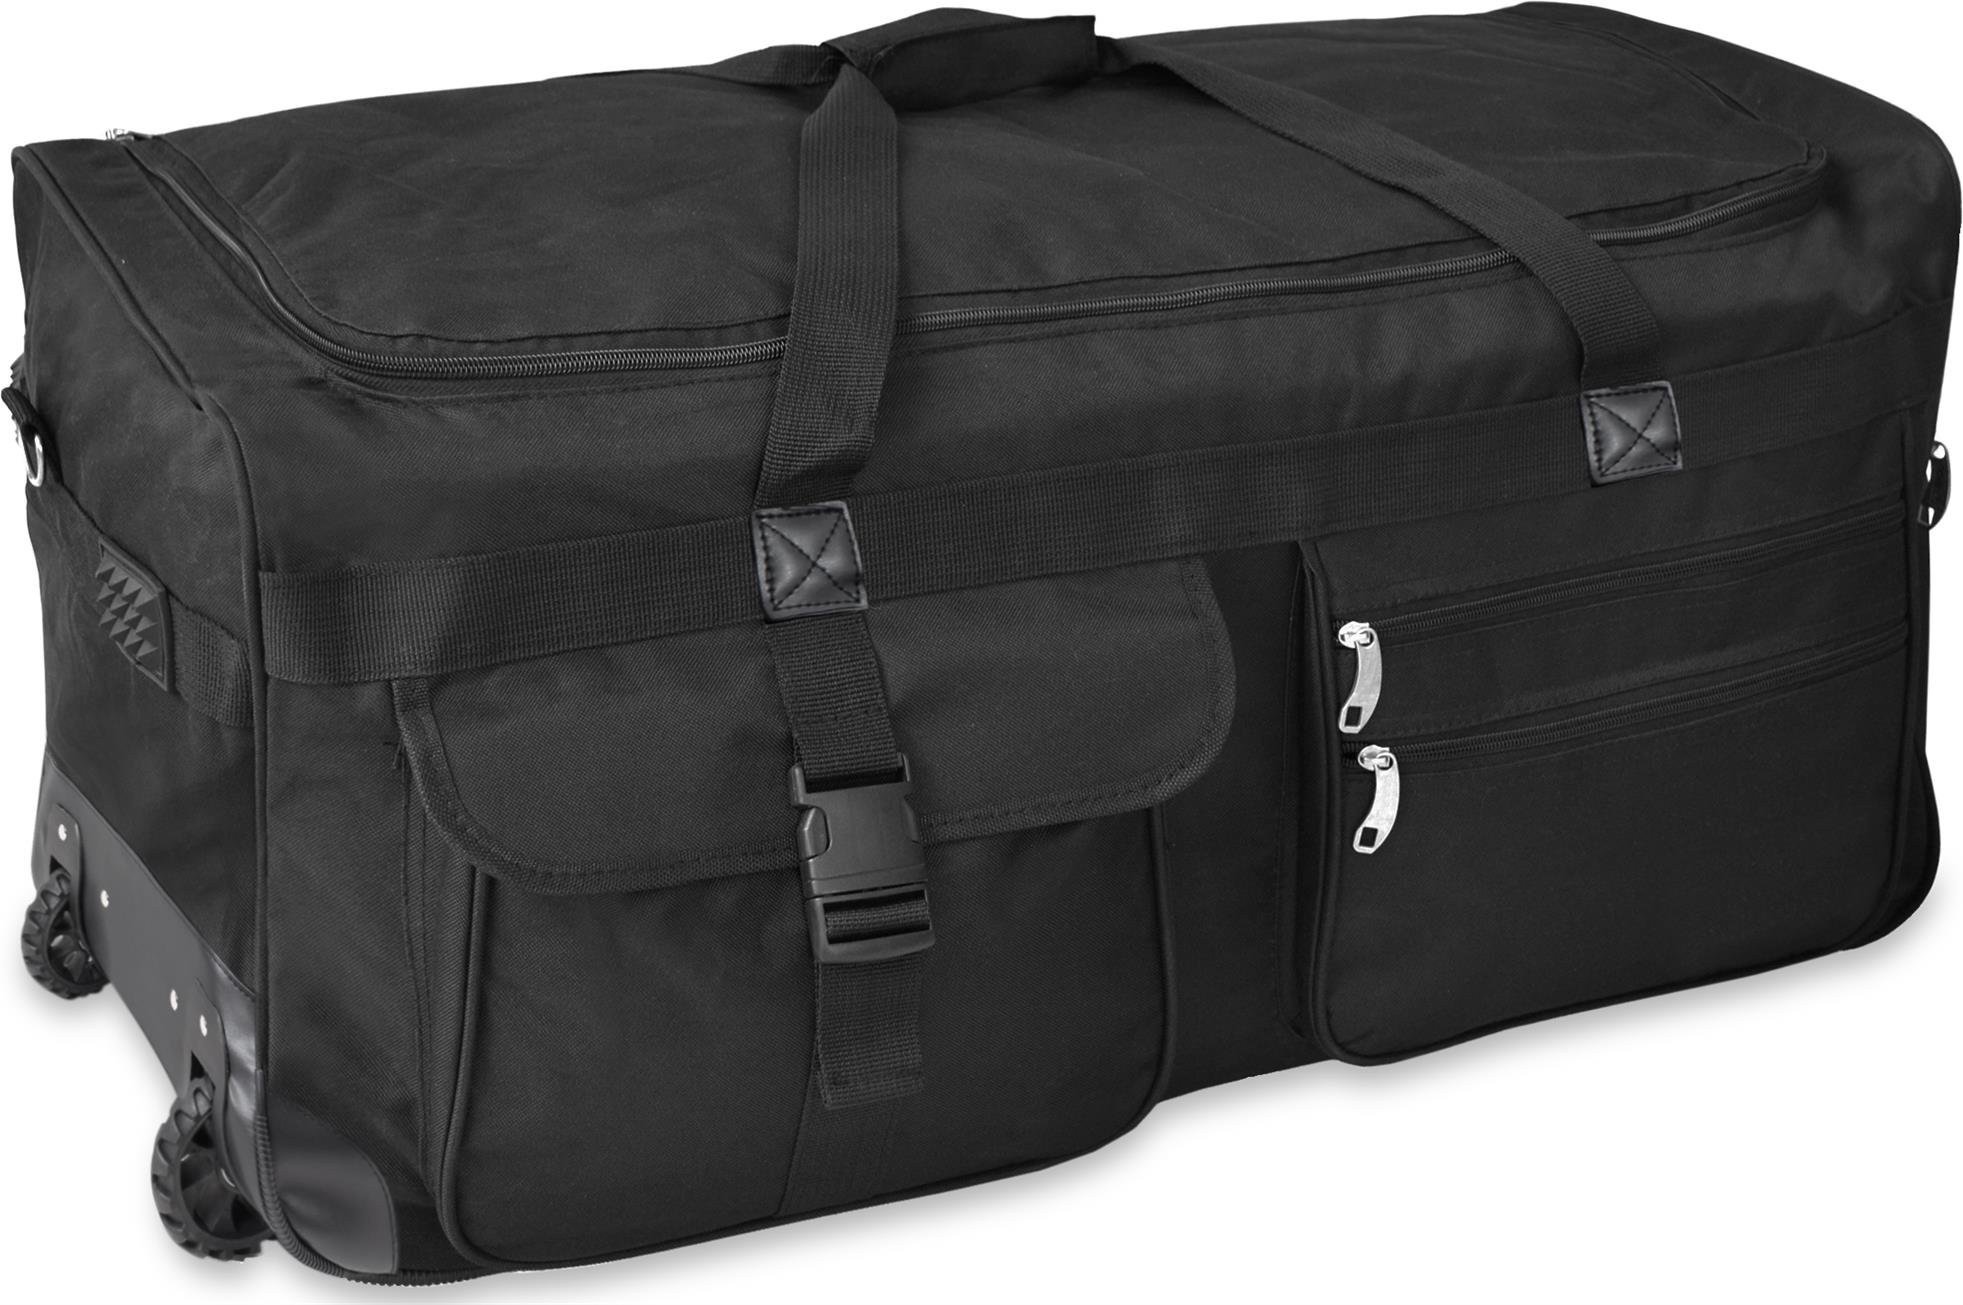 gearup extra gro er trolley reisekoffer reisetasche 80 100 120 oder 150 liter w hlbar koffer. Black Bedroom Furniture Sets. Home Design Ideas